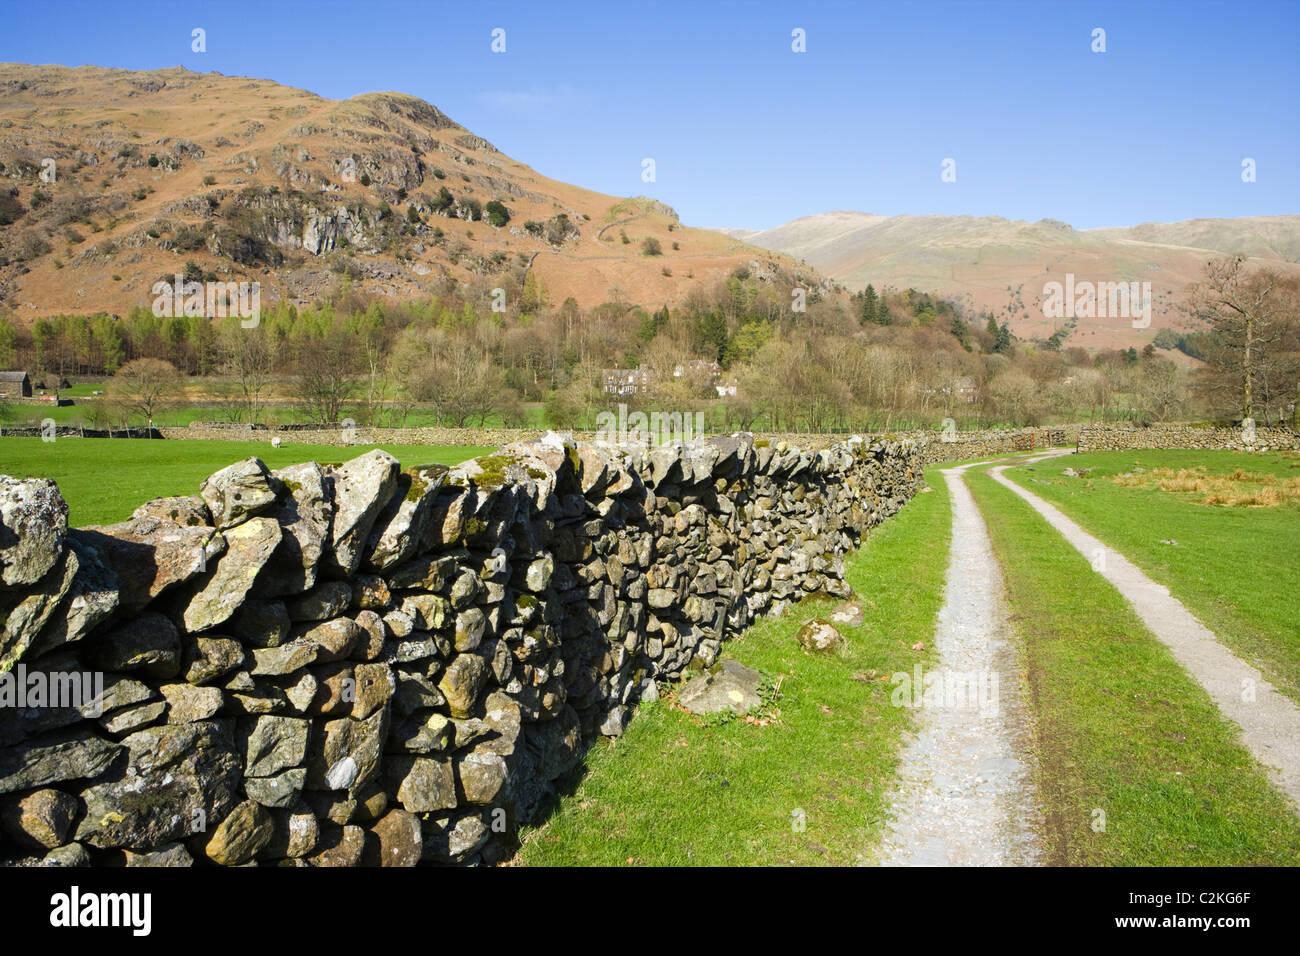 Track und Trockenmauern Wand, Grasmere, Nationalpark Lake District, Cumbria, UK Stockbild